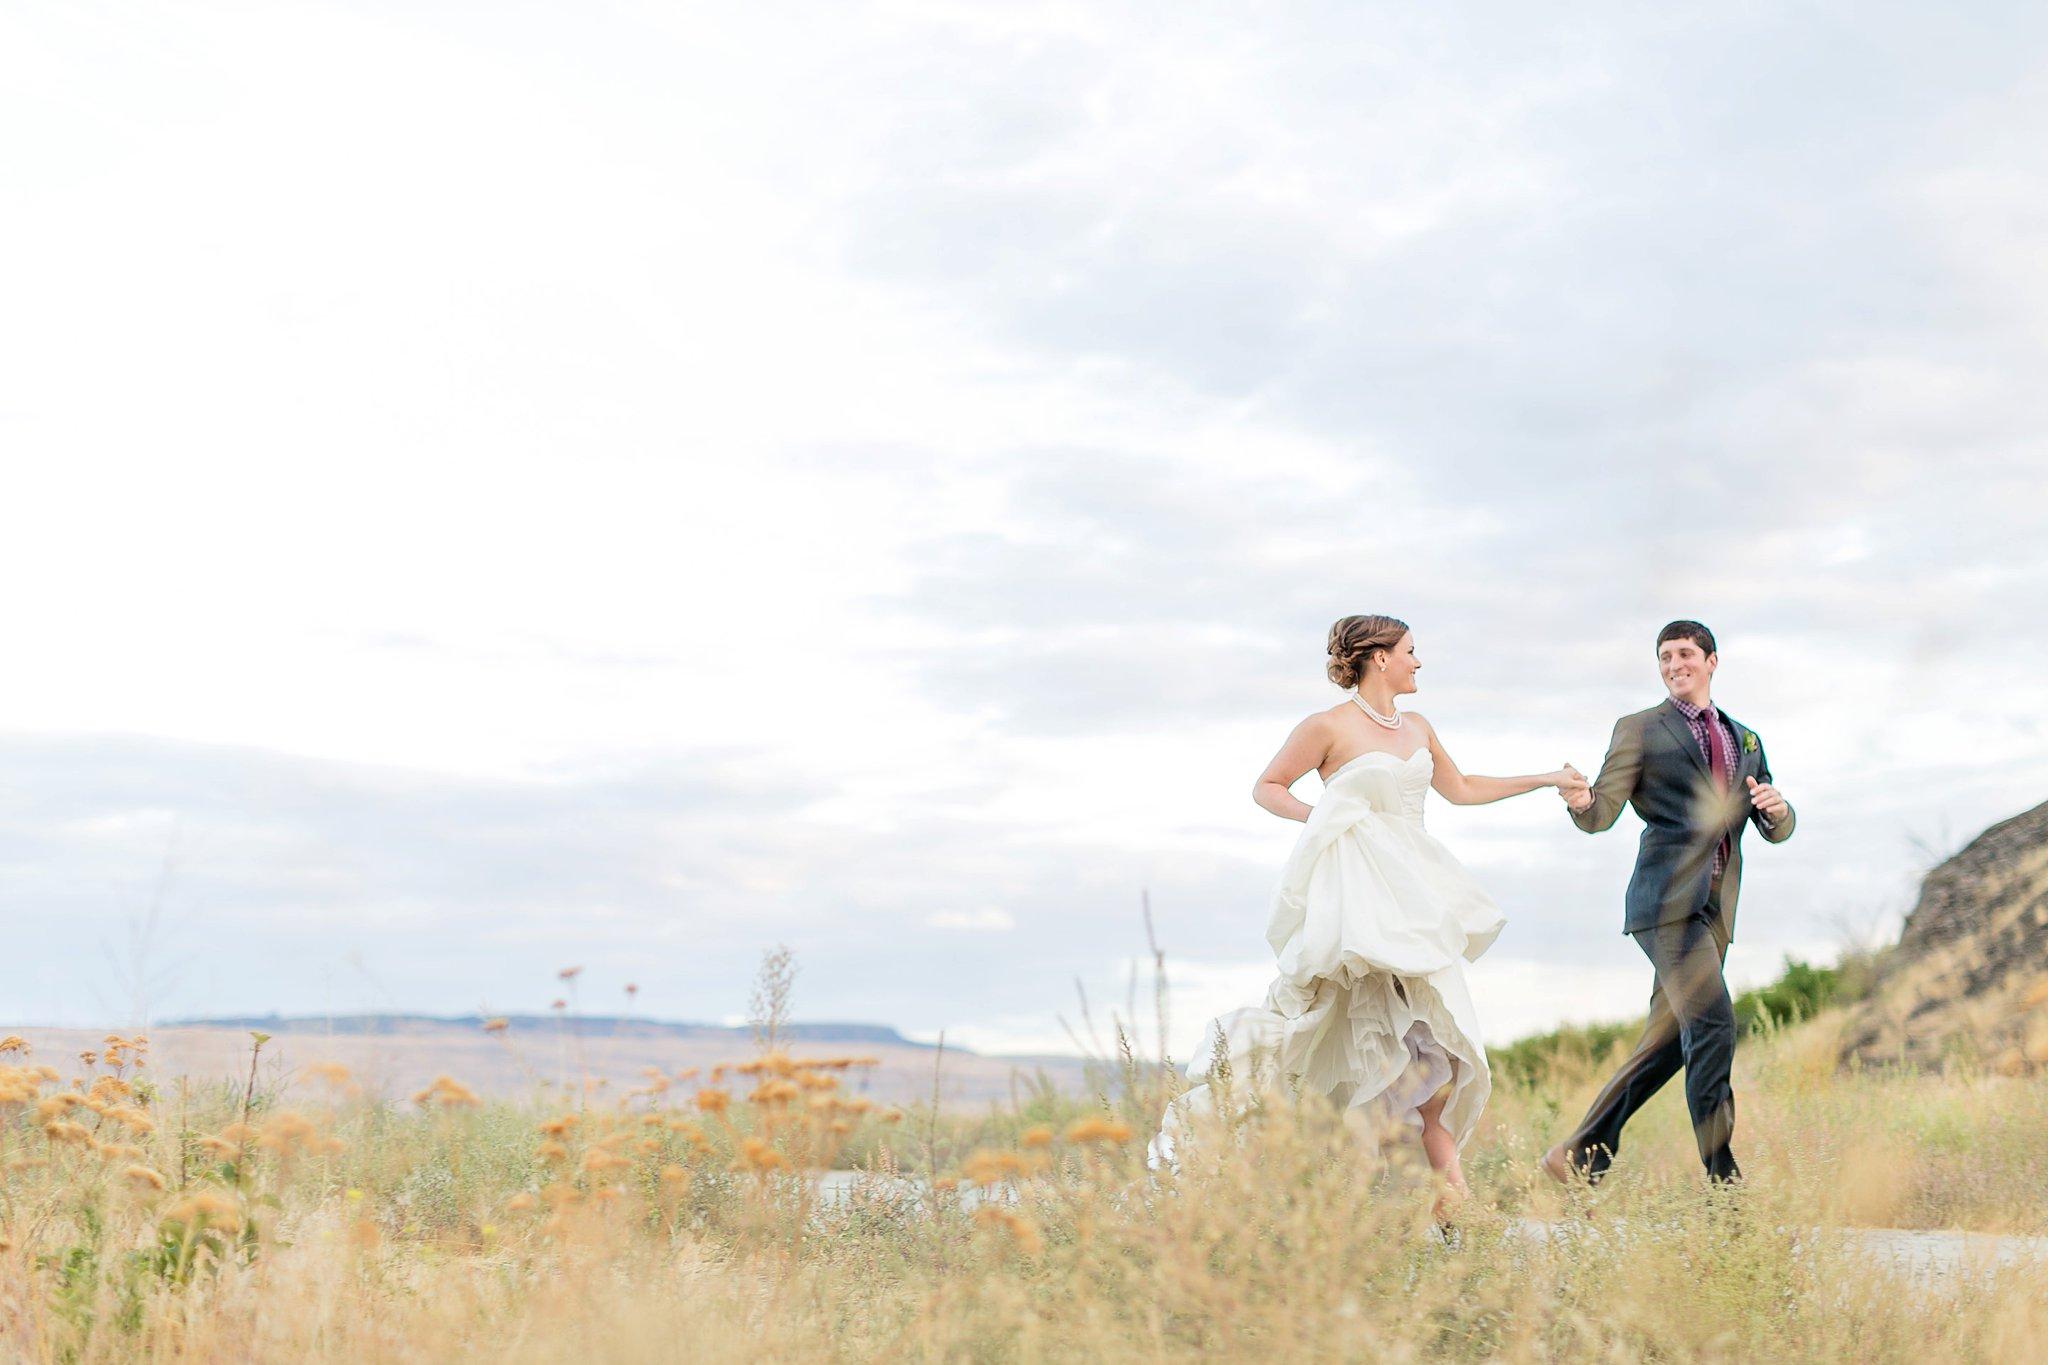 Chelan Washington Wedding Photos Megan Kelsey Photography Delight Wedding Workshop Styled Shoot Annalee & Scot-245.jpg